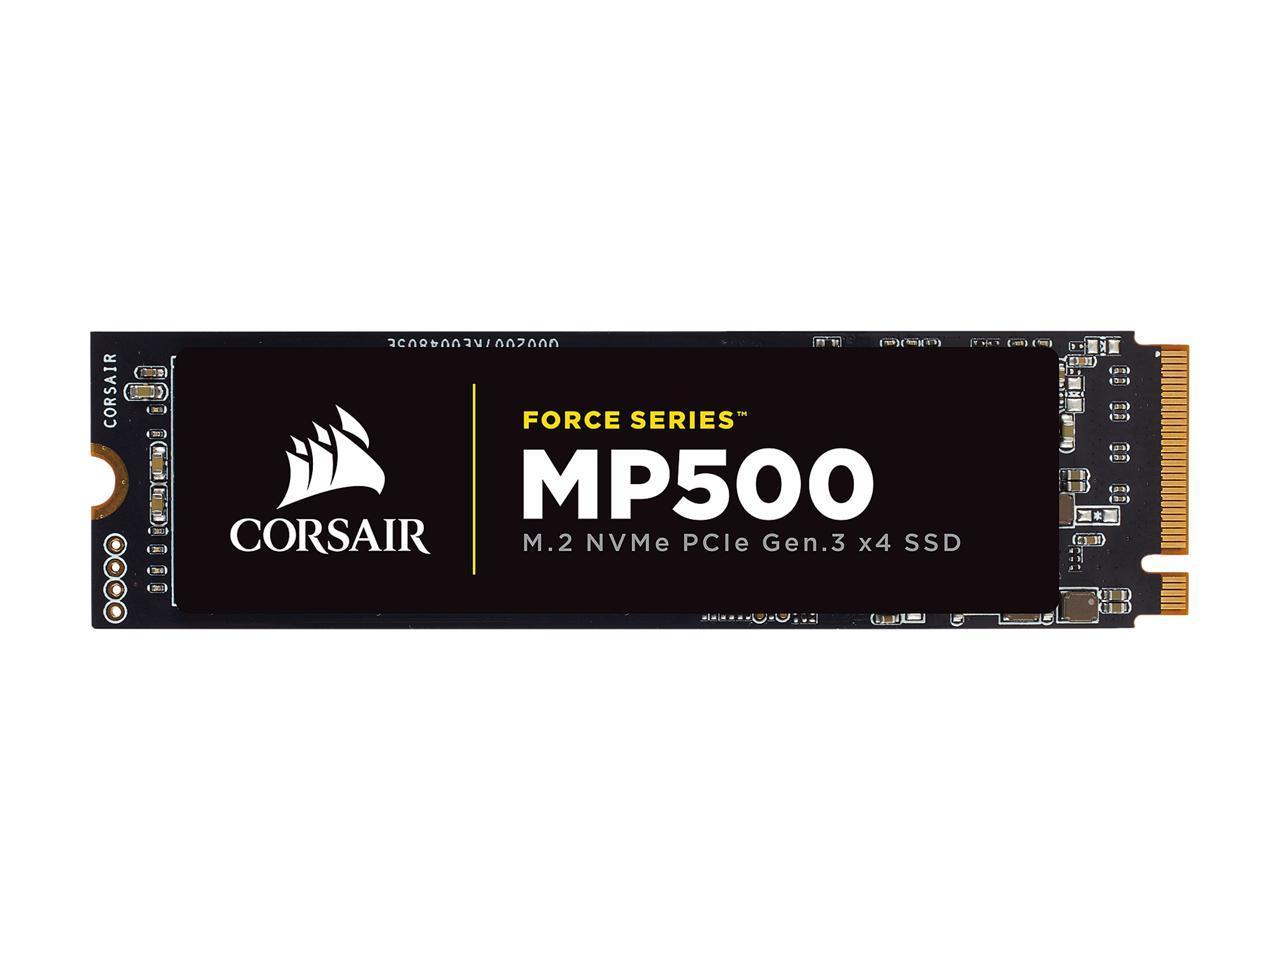 Corsair SSD Force Series MP500 M.2 2280 240GB NVMe PCI-Express 3.0 x4 MLC 240G PCIe Gen. 3 Internal Solid State Drive CSSD-F240GBMP500 1